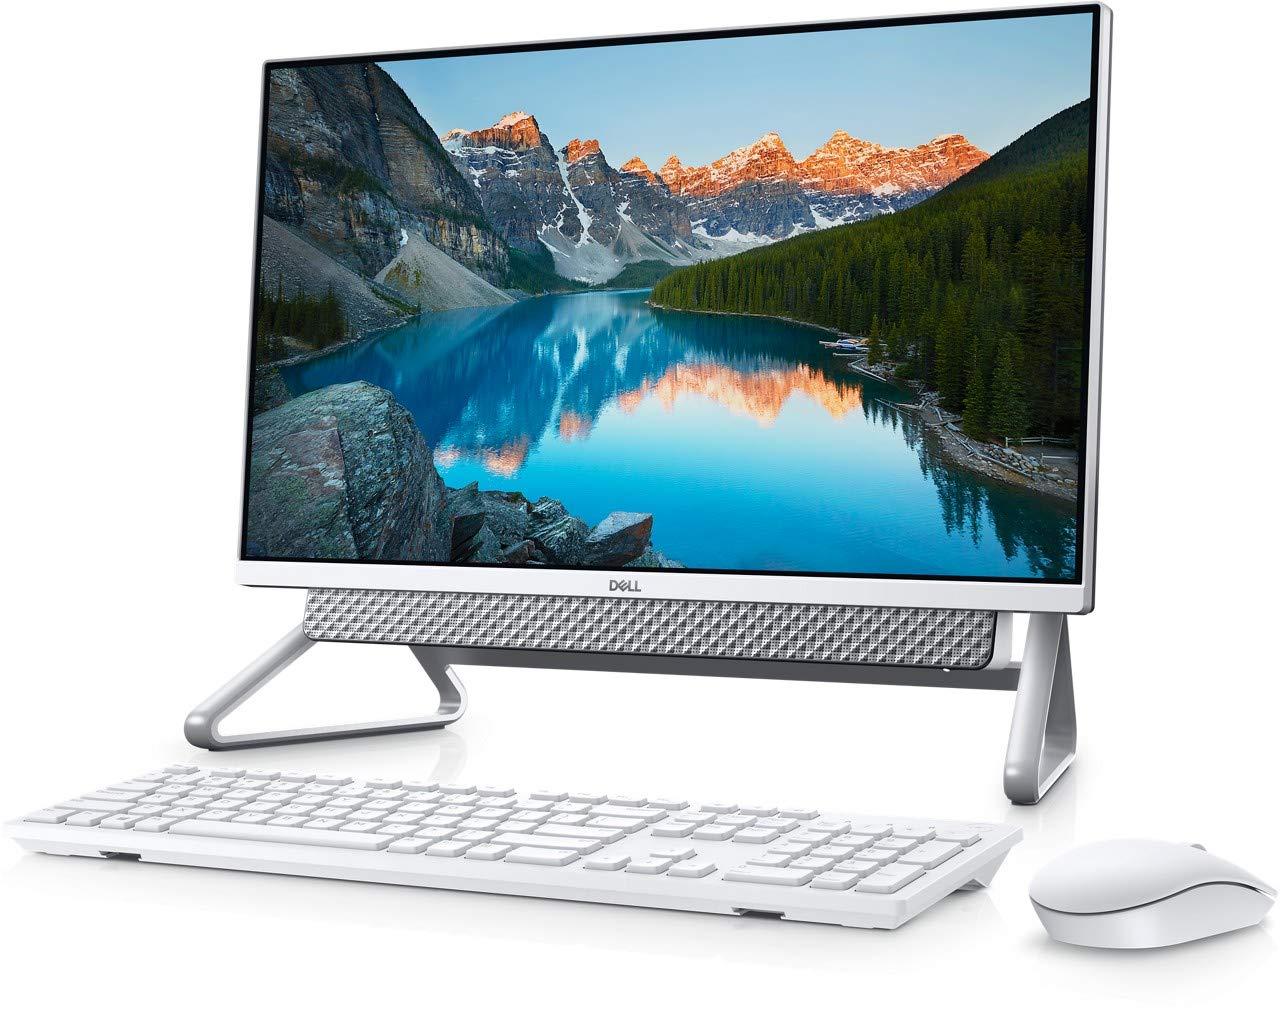 SSD Drive | Gaming | Laptop | Desktop | 1 Best Offers 17